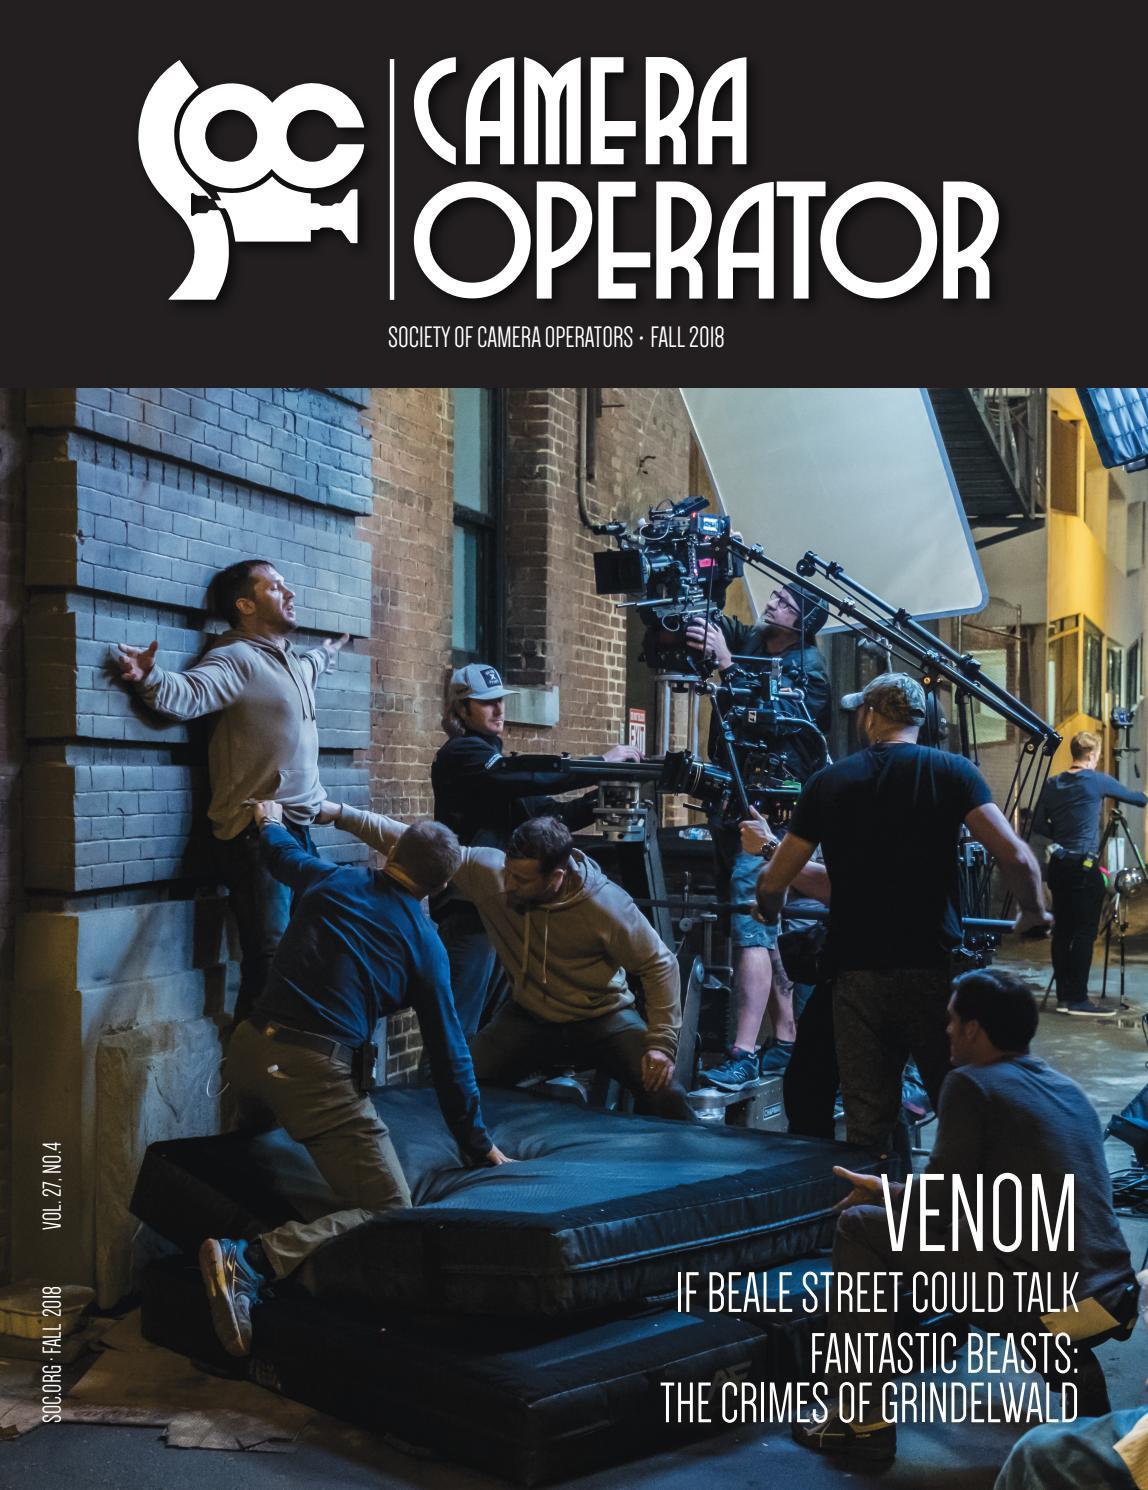 Camera Operator: Fall 2018 by Society of Camera Operators